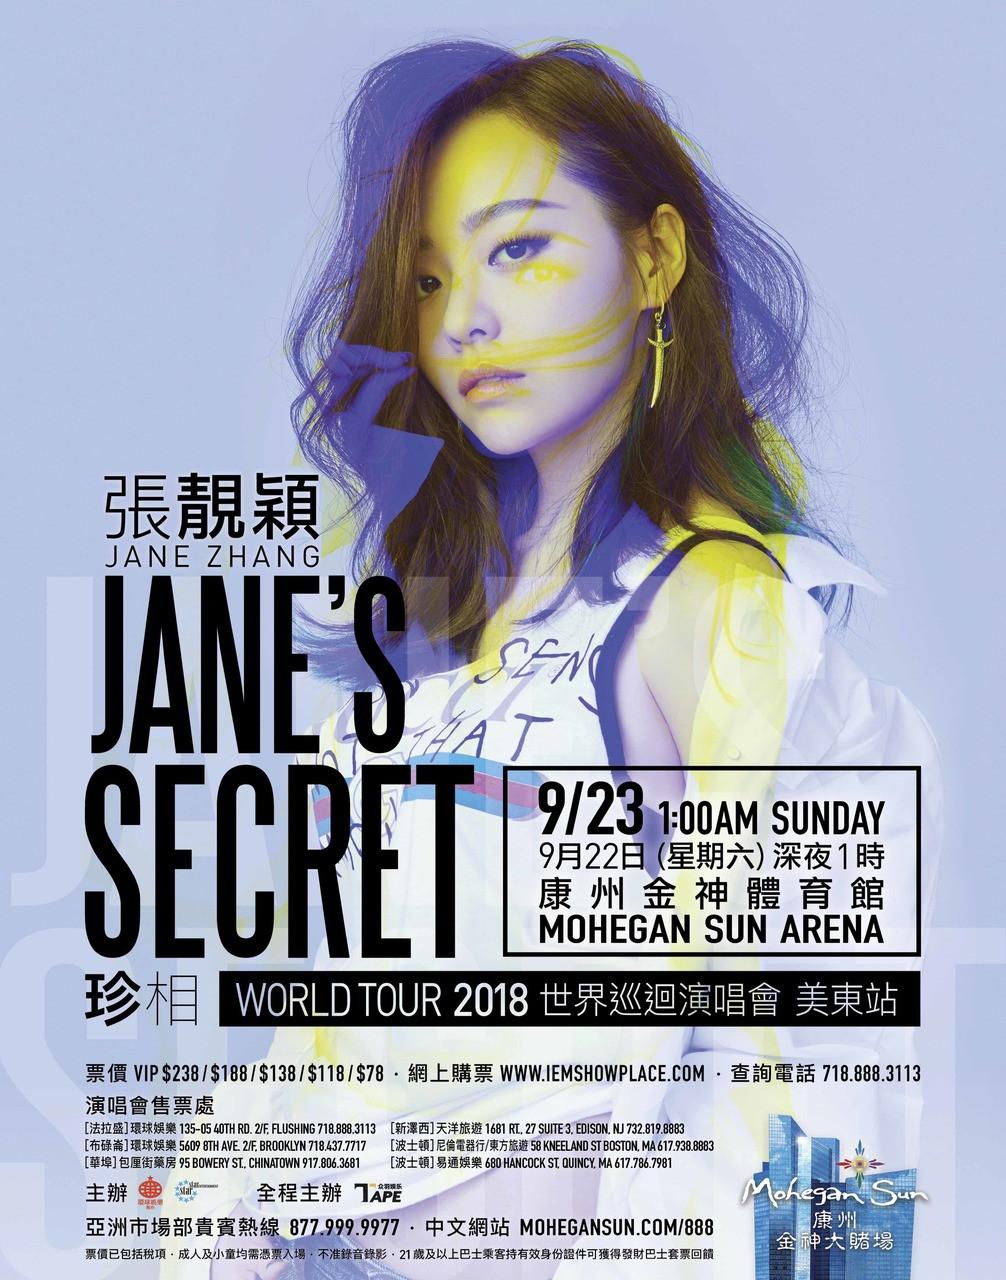 張靚穎 珍相 世界巡迴演唱會2018 - 美東站 JANE ZHANG ( JANE'S SECRET ) WORLD TOUR 2018 Poster